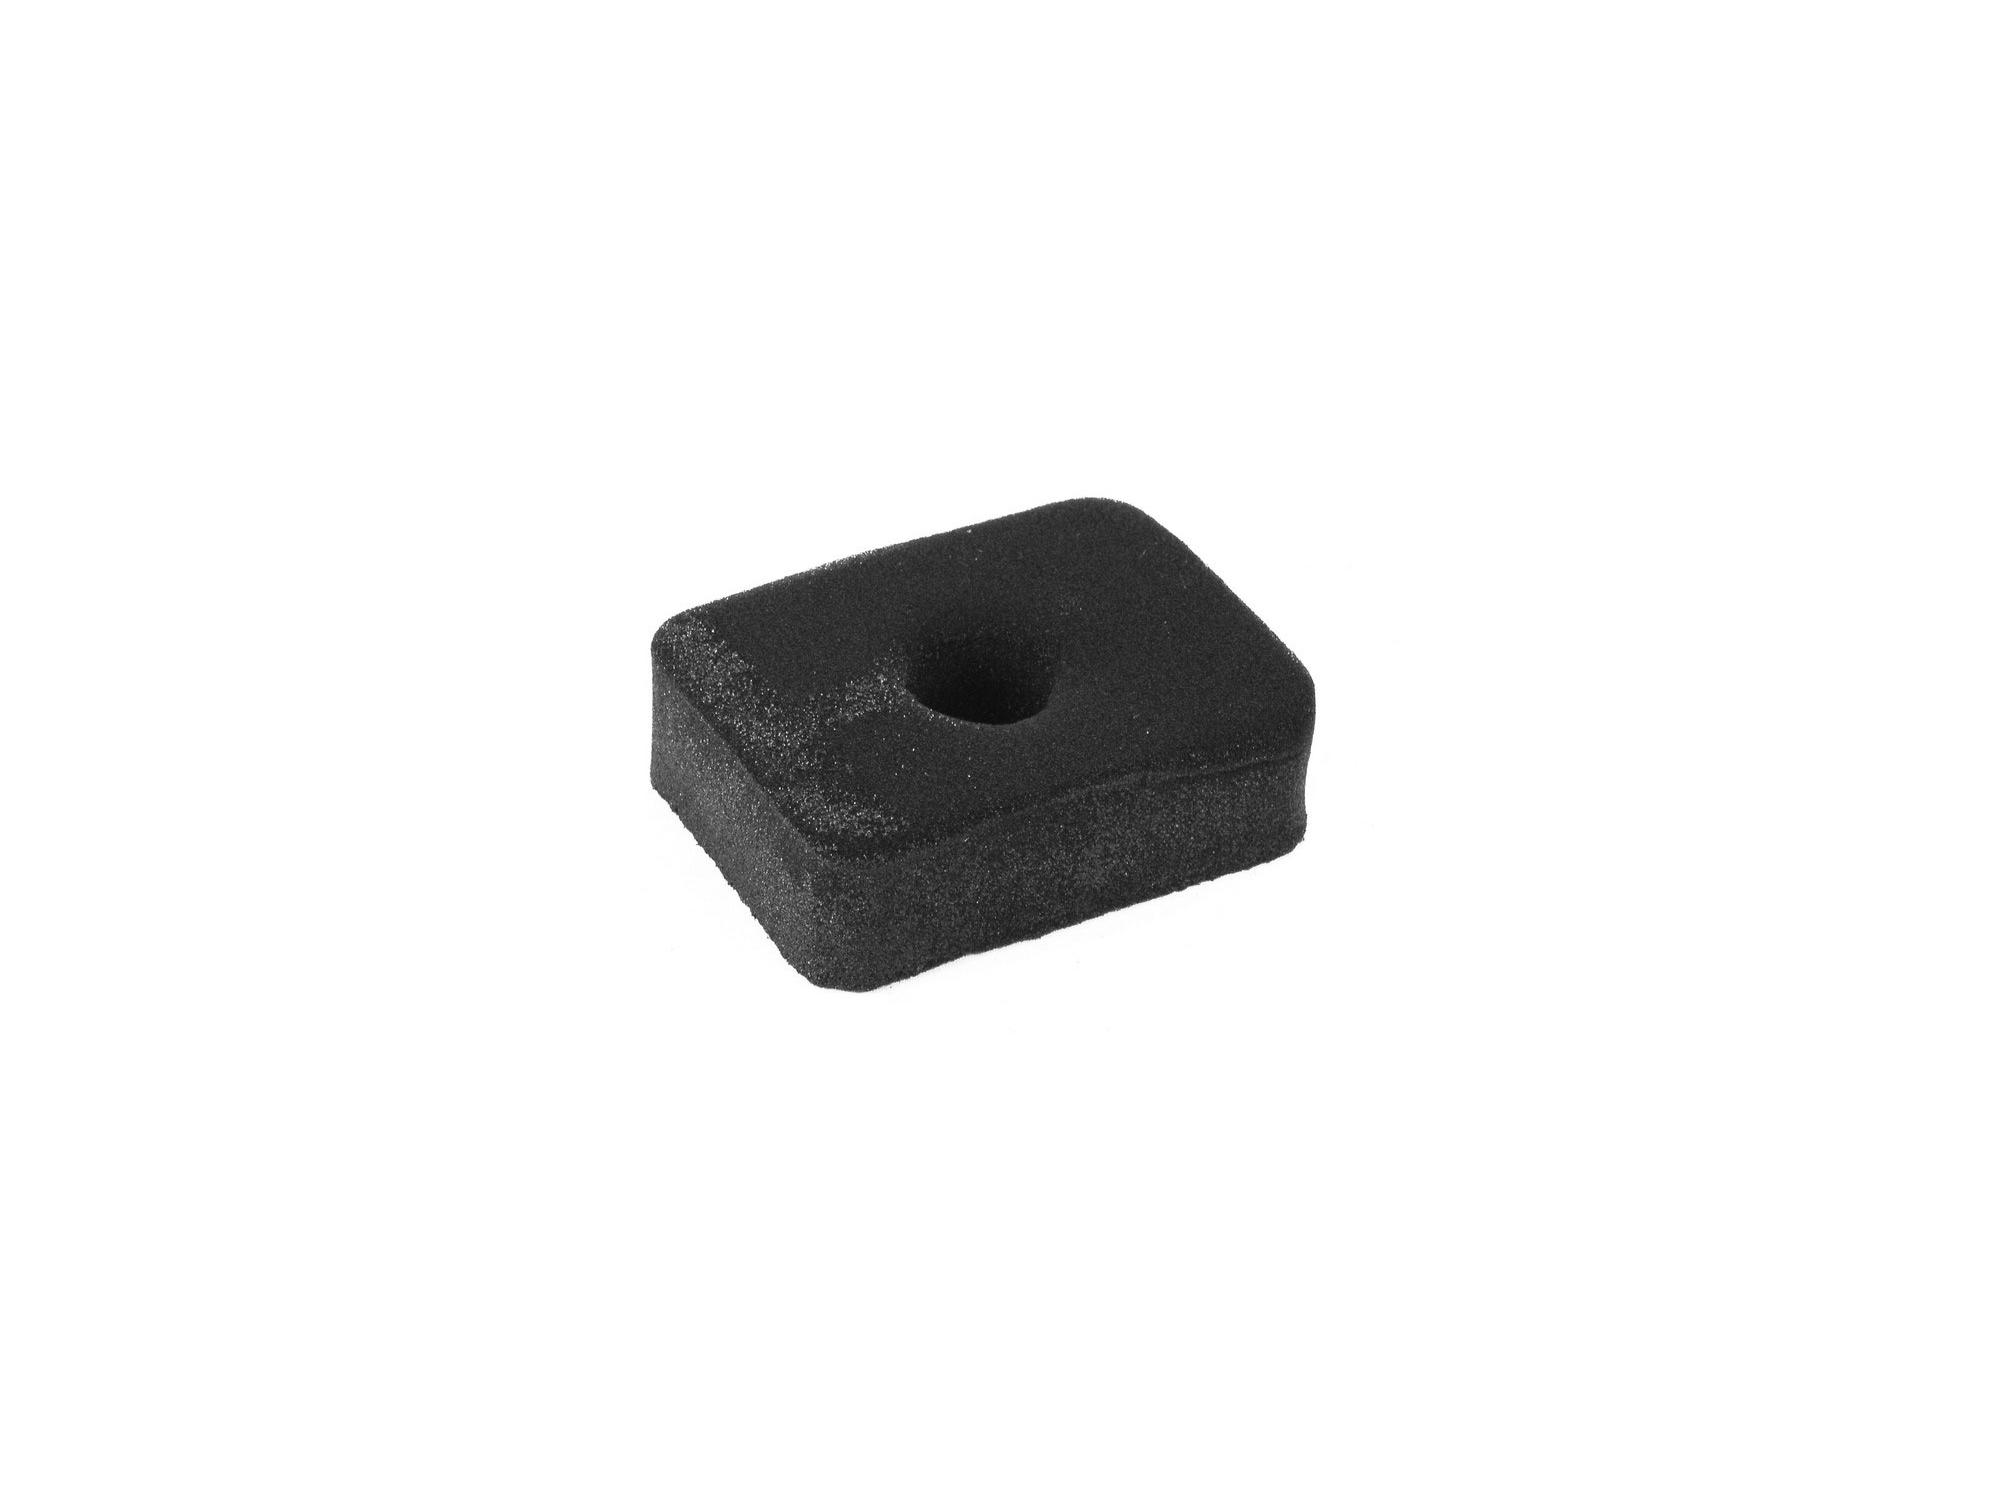 filtr vzduchový, HERON 8896111A